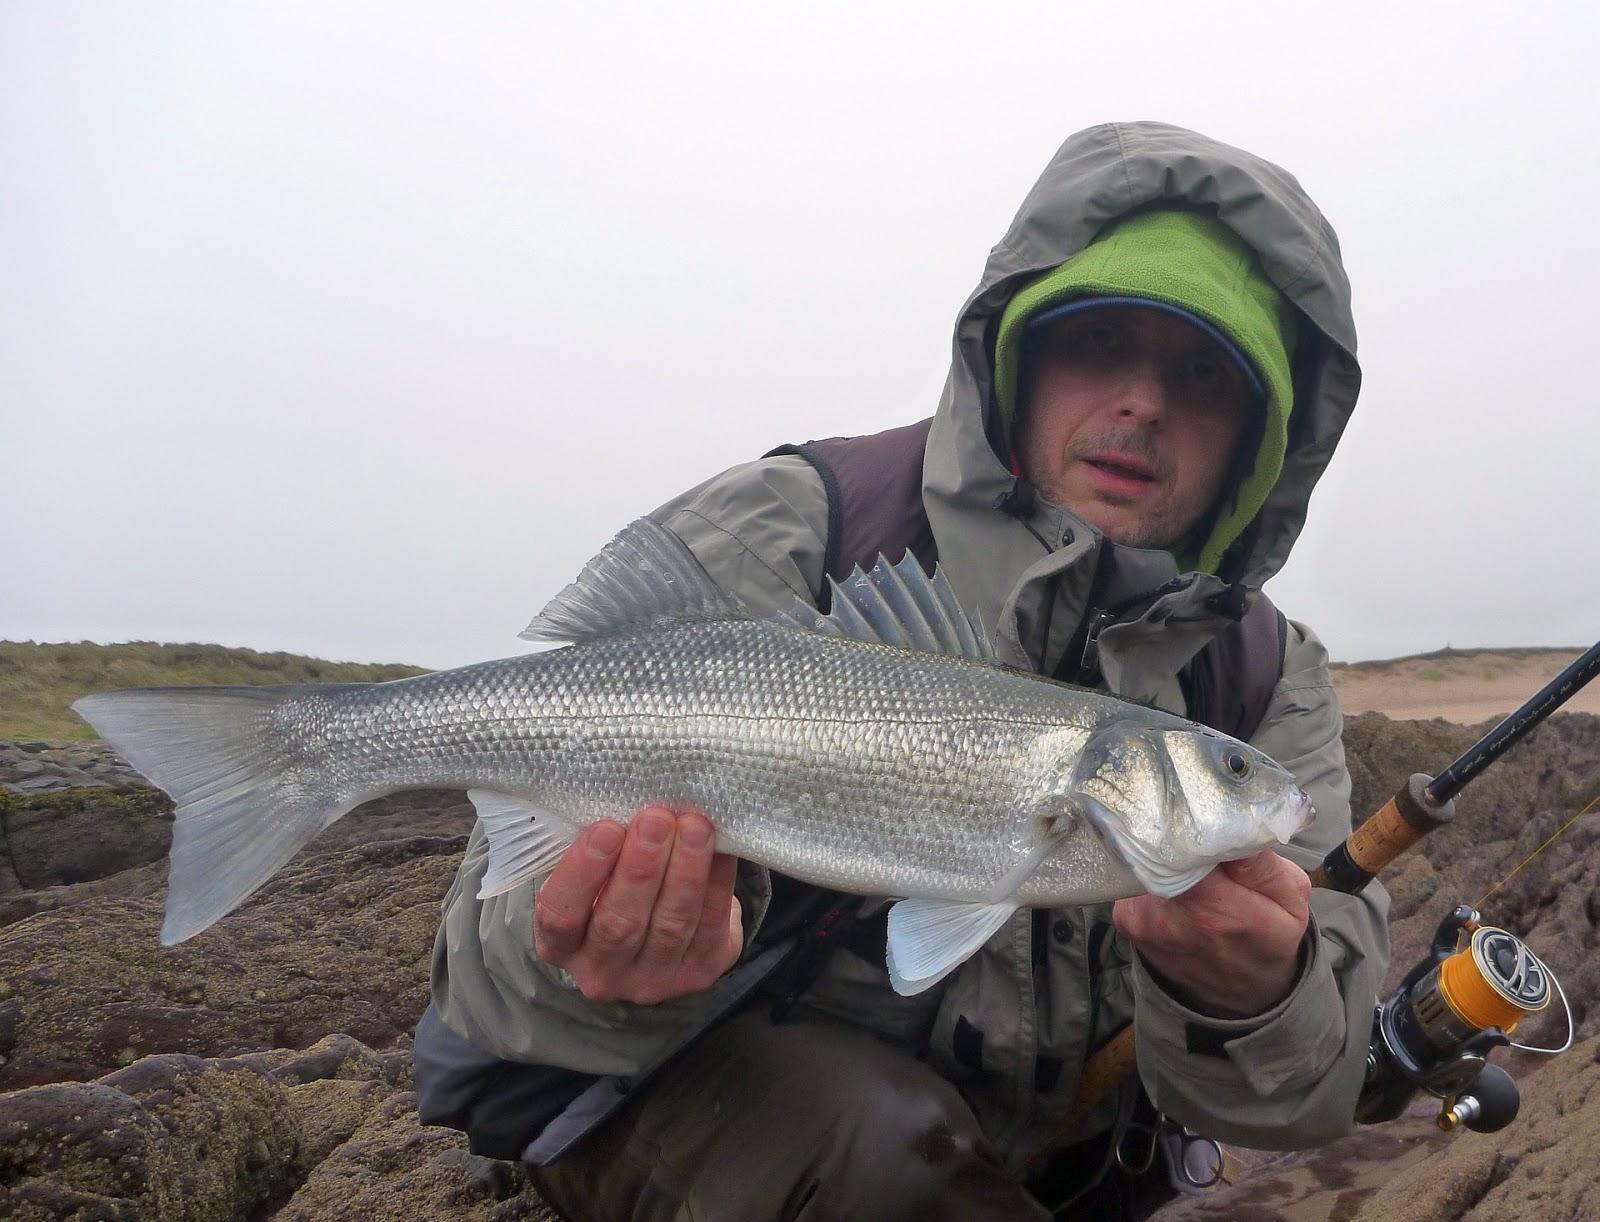 Sea bass hunting sea bass season 2017 open for Bucs fishing report